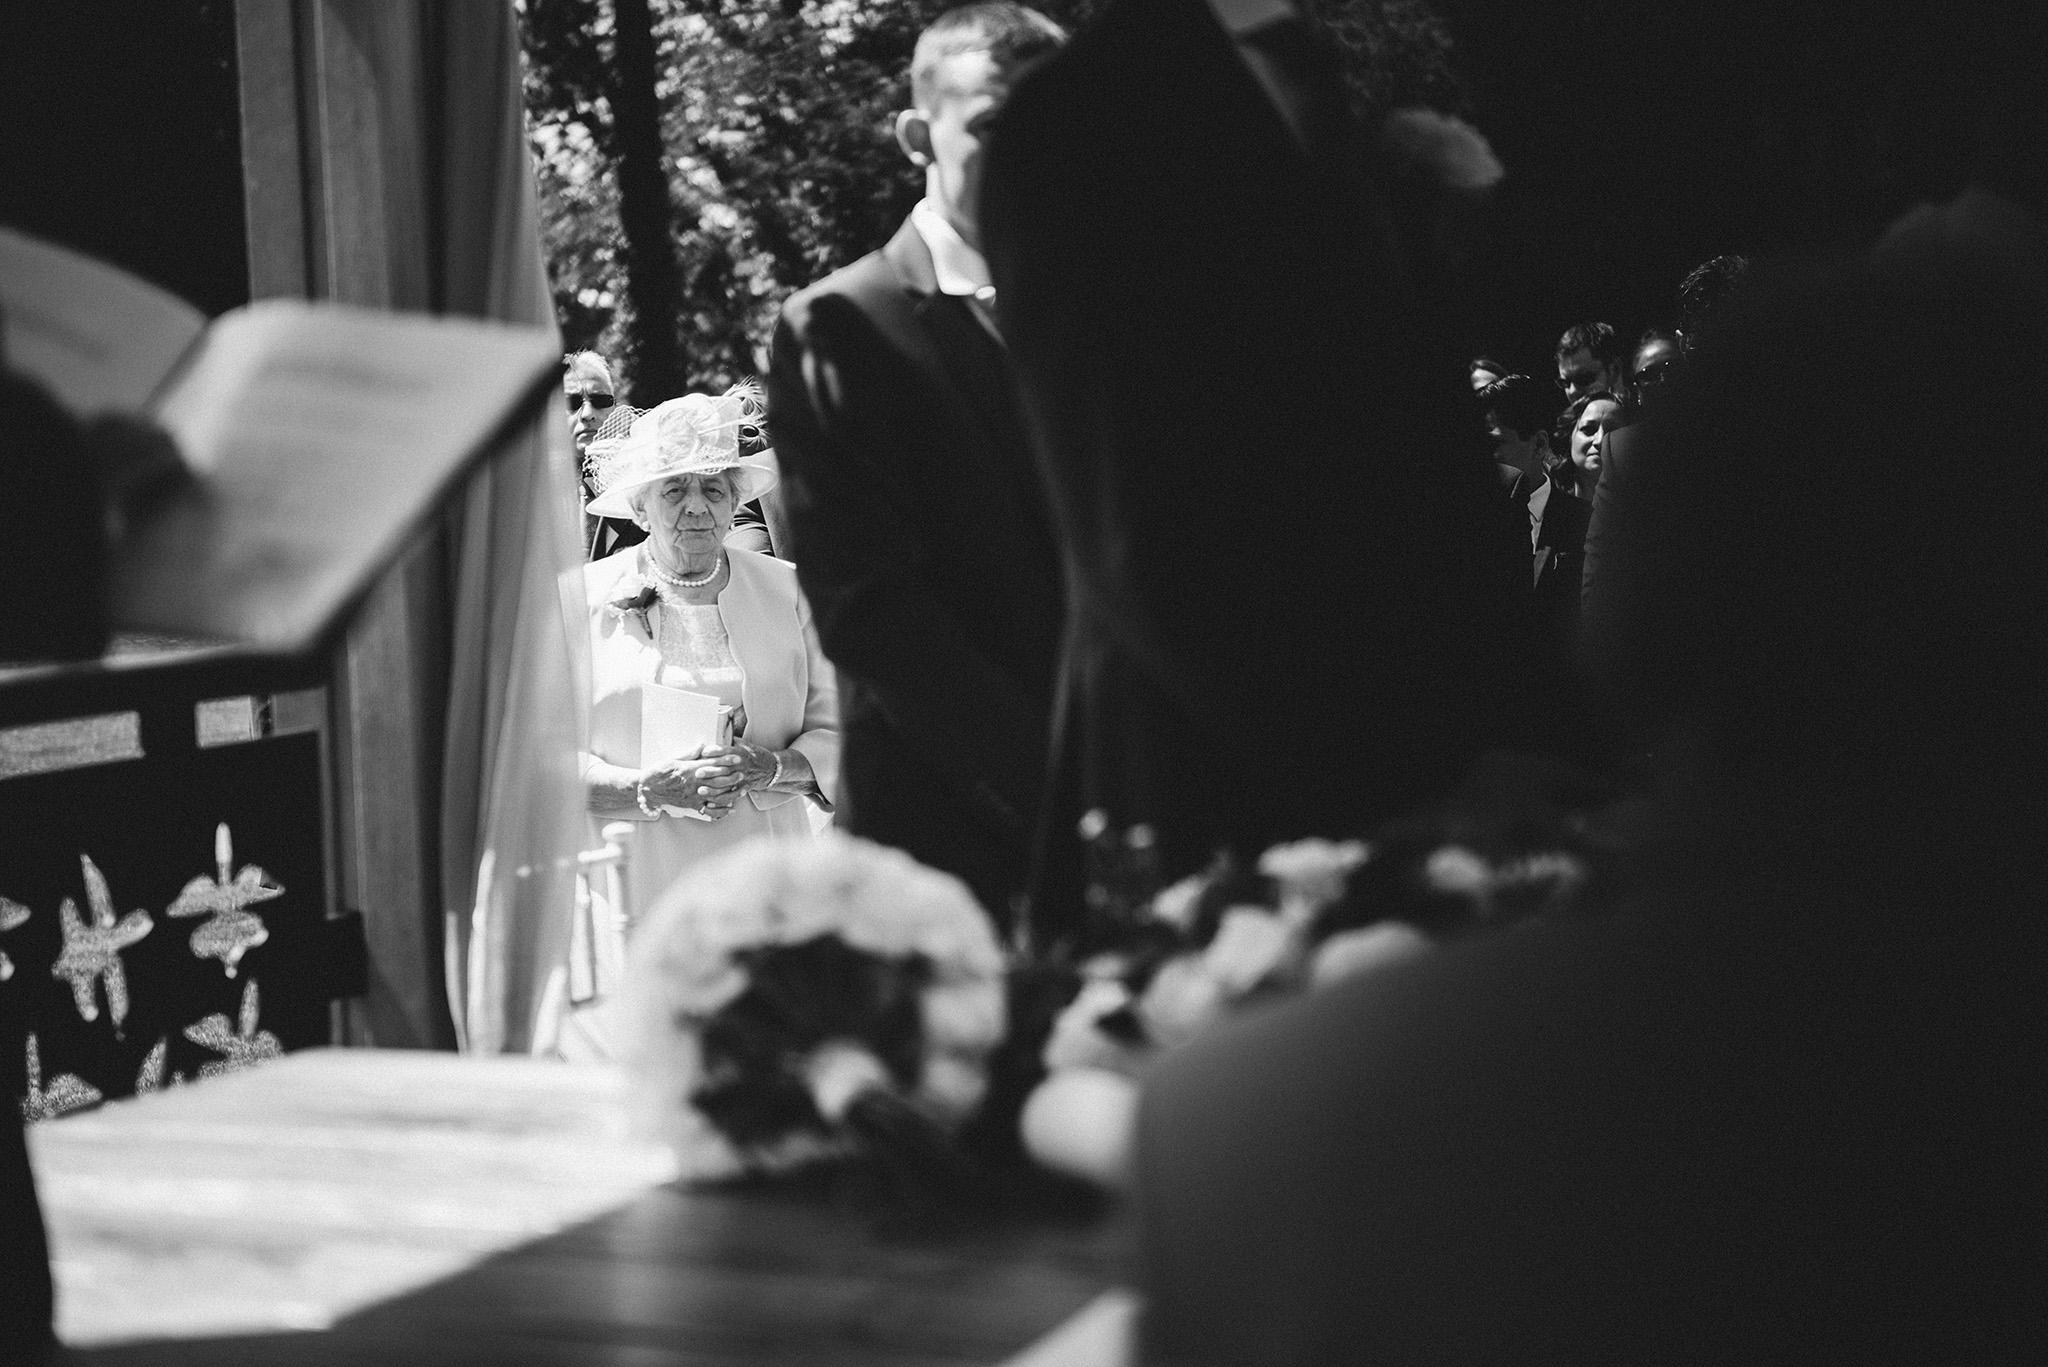 scott-stockwell-photography-wedding-009.jpg